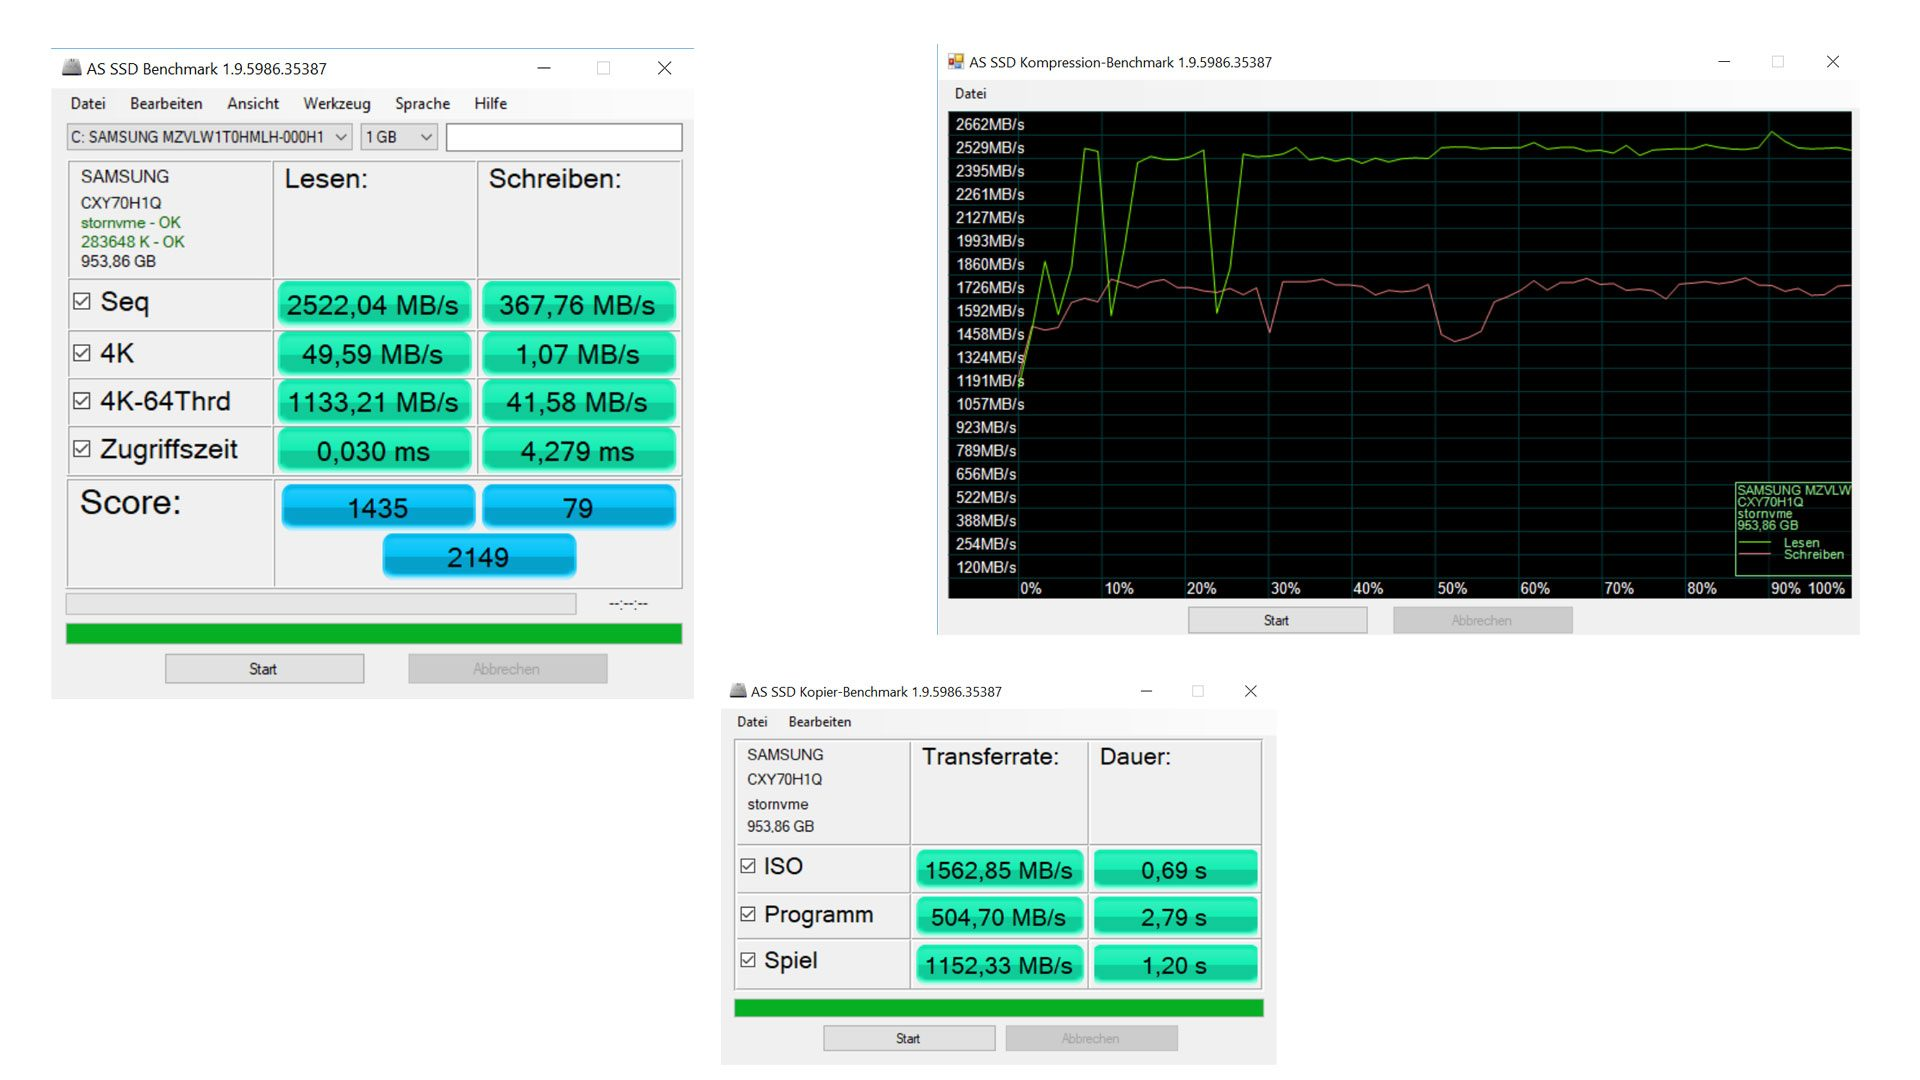 HP-Spectre-x360-13-ac002ng_Benchmark-6